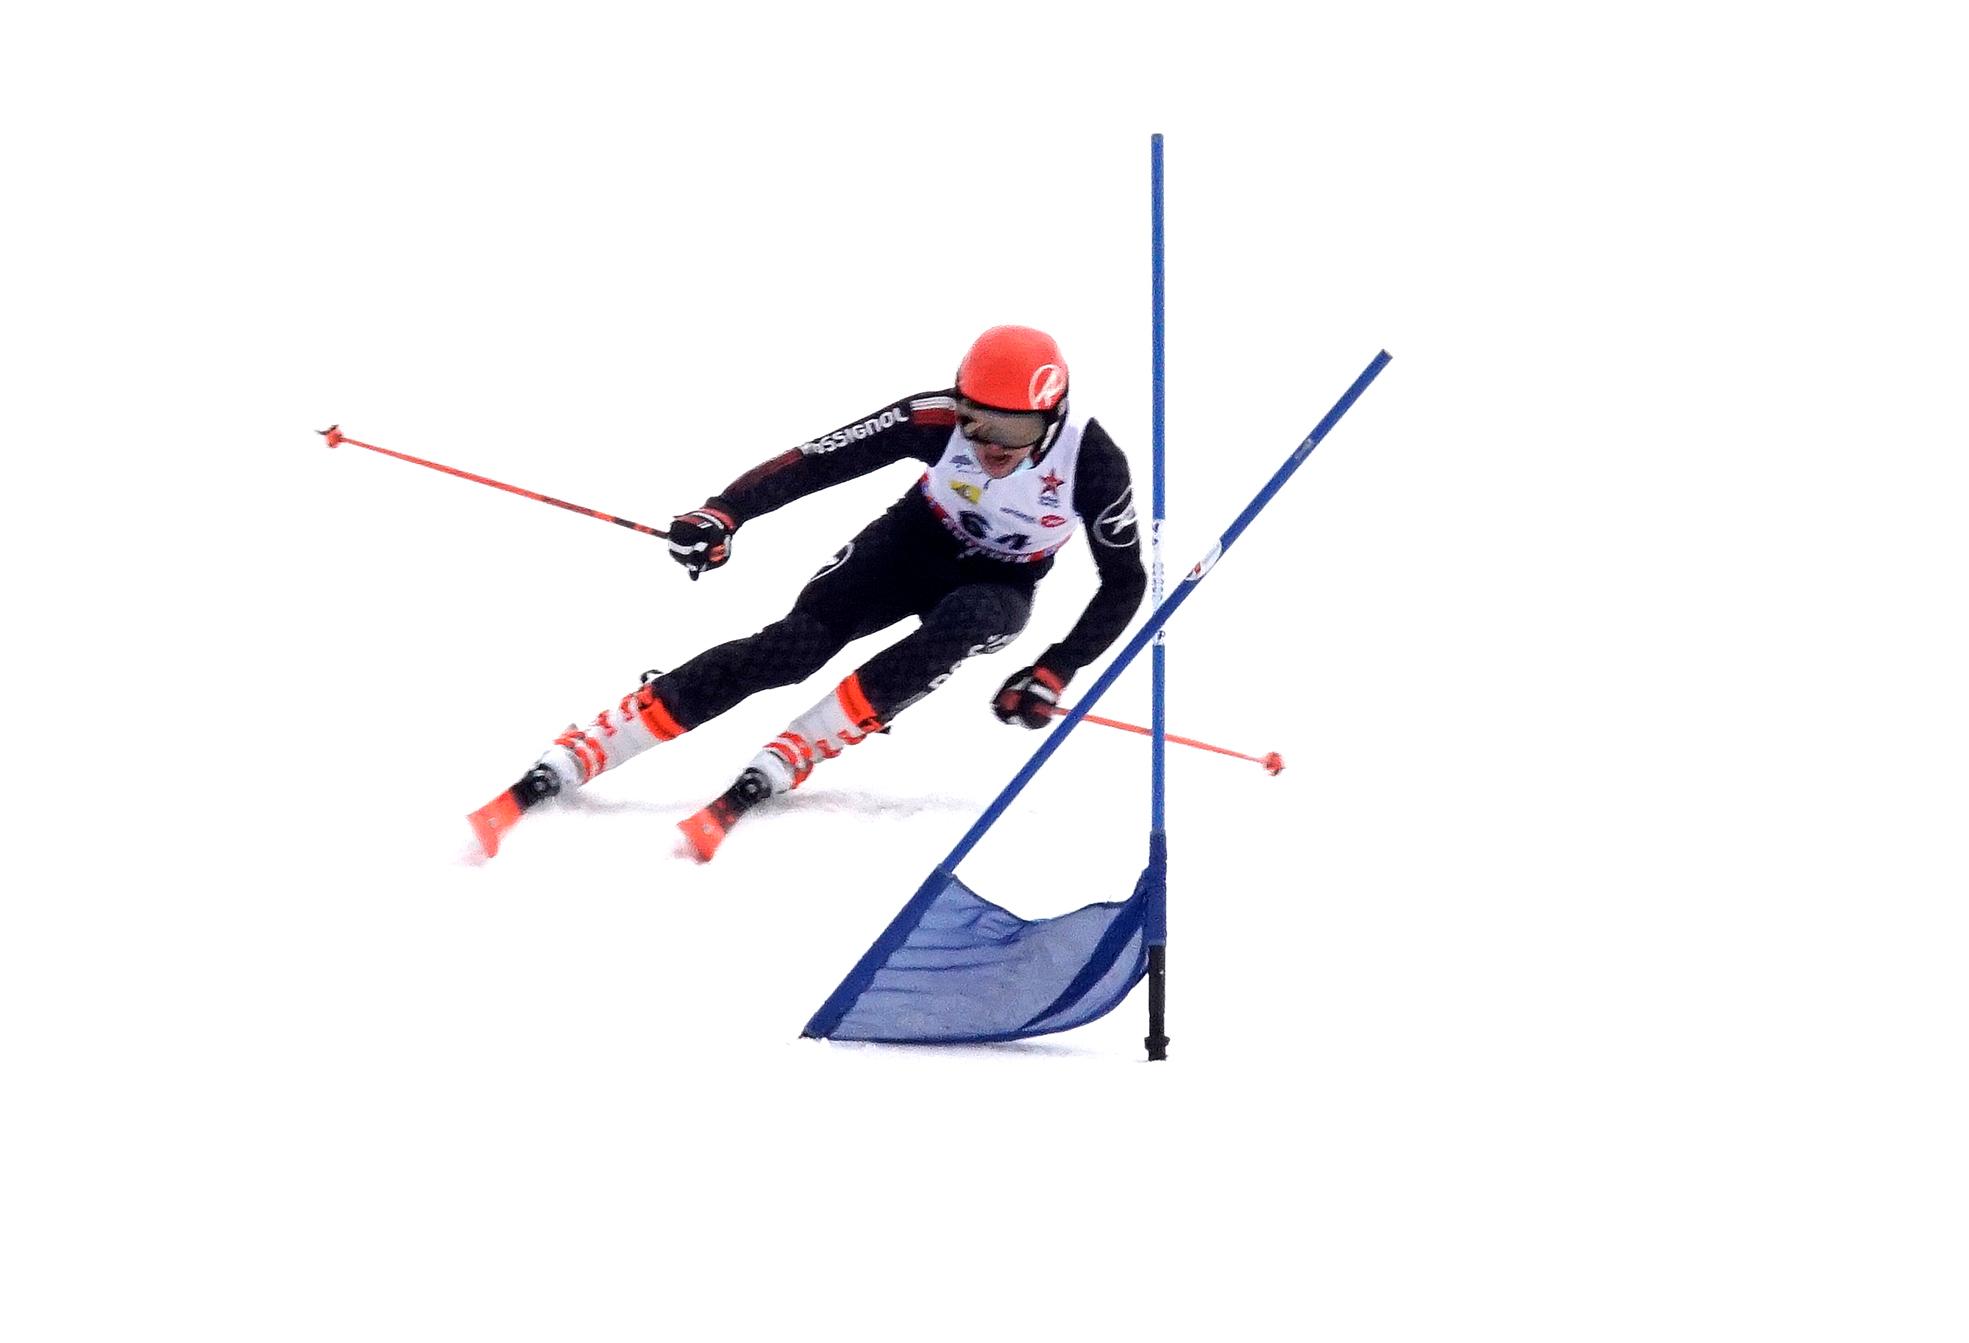 Flèche_USB_ski_Chabanon_27_février_2021_